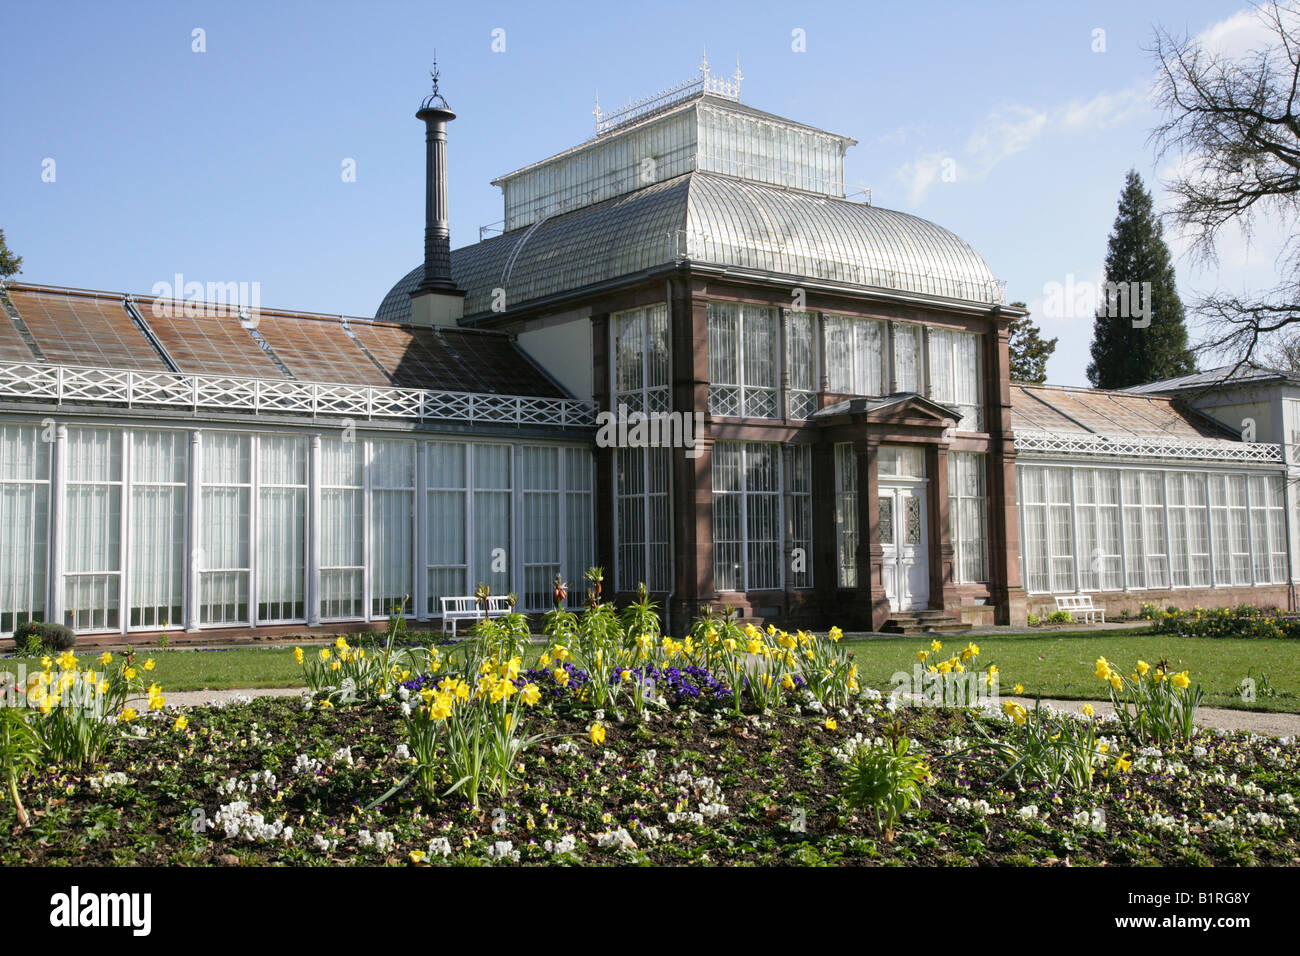 19th century greenhouse, Wilhelmshoehe Castle, Kassel, Hesse, Germany, Europe - Stock Image